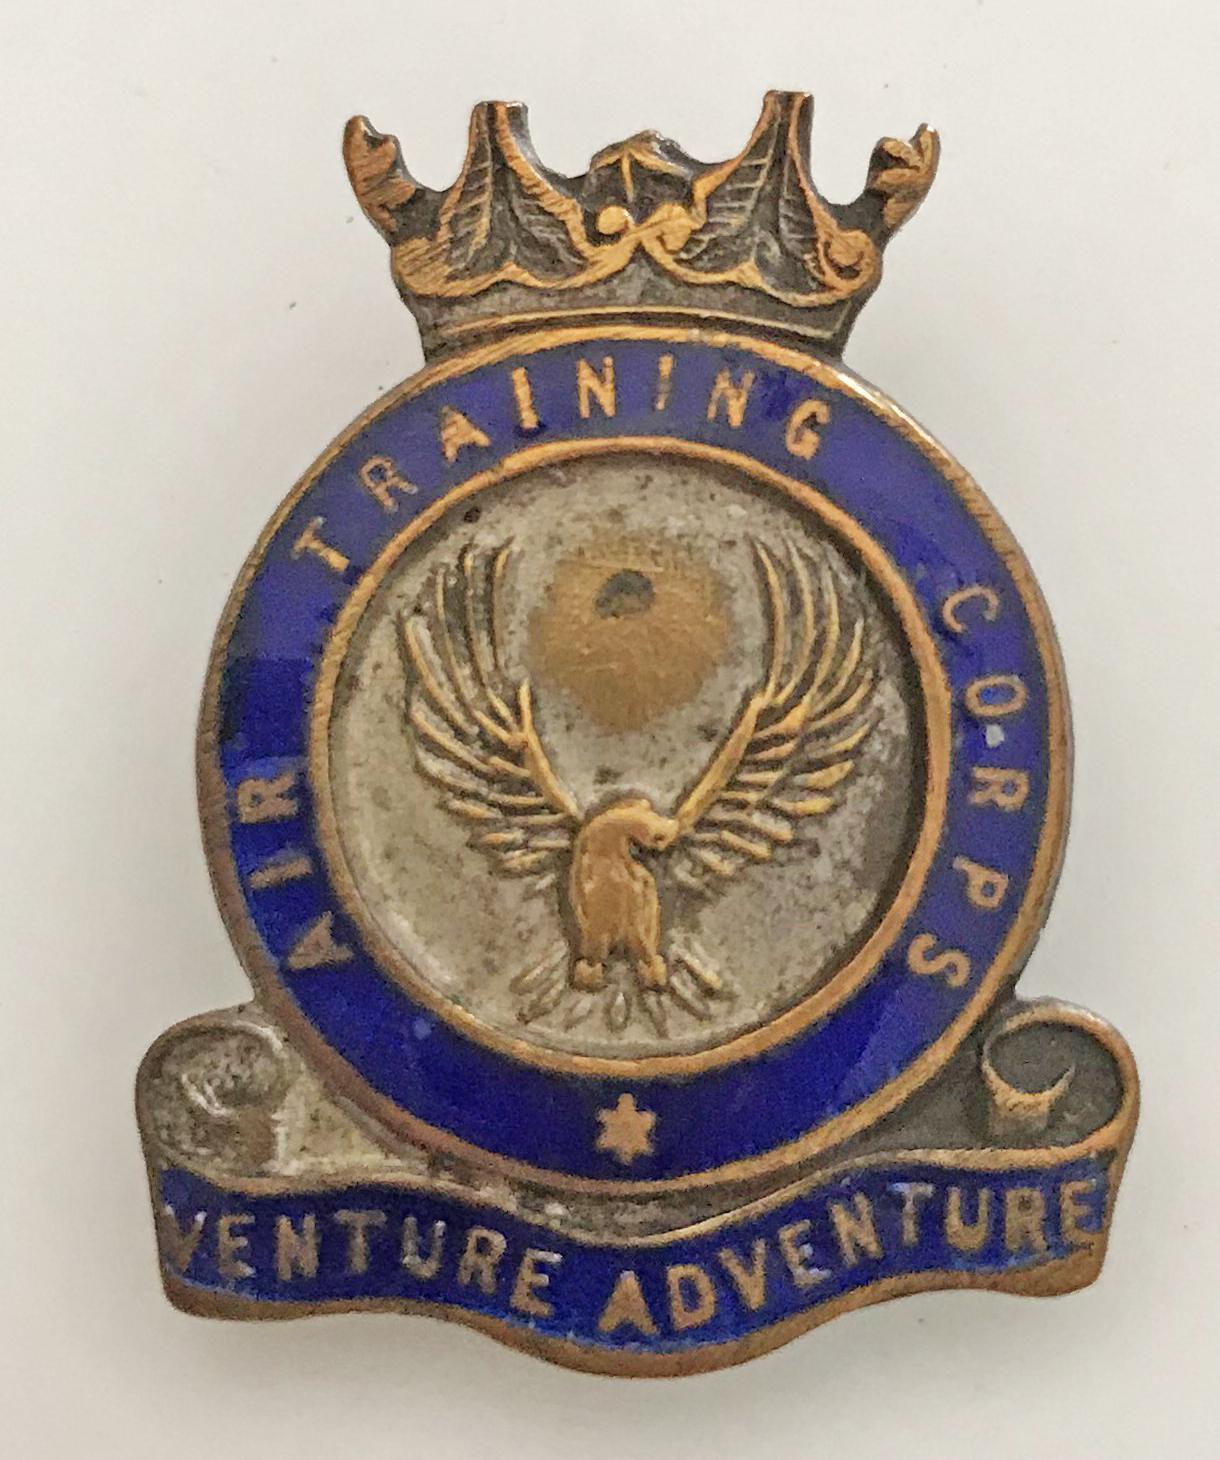 WW2 Air Training Corps lapel badge